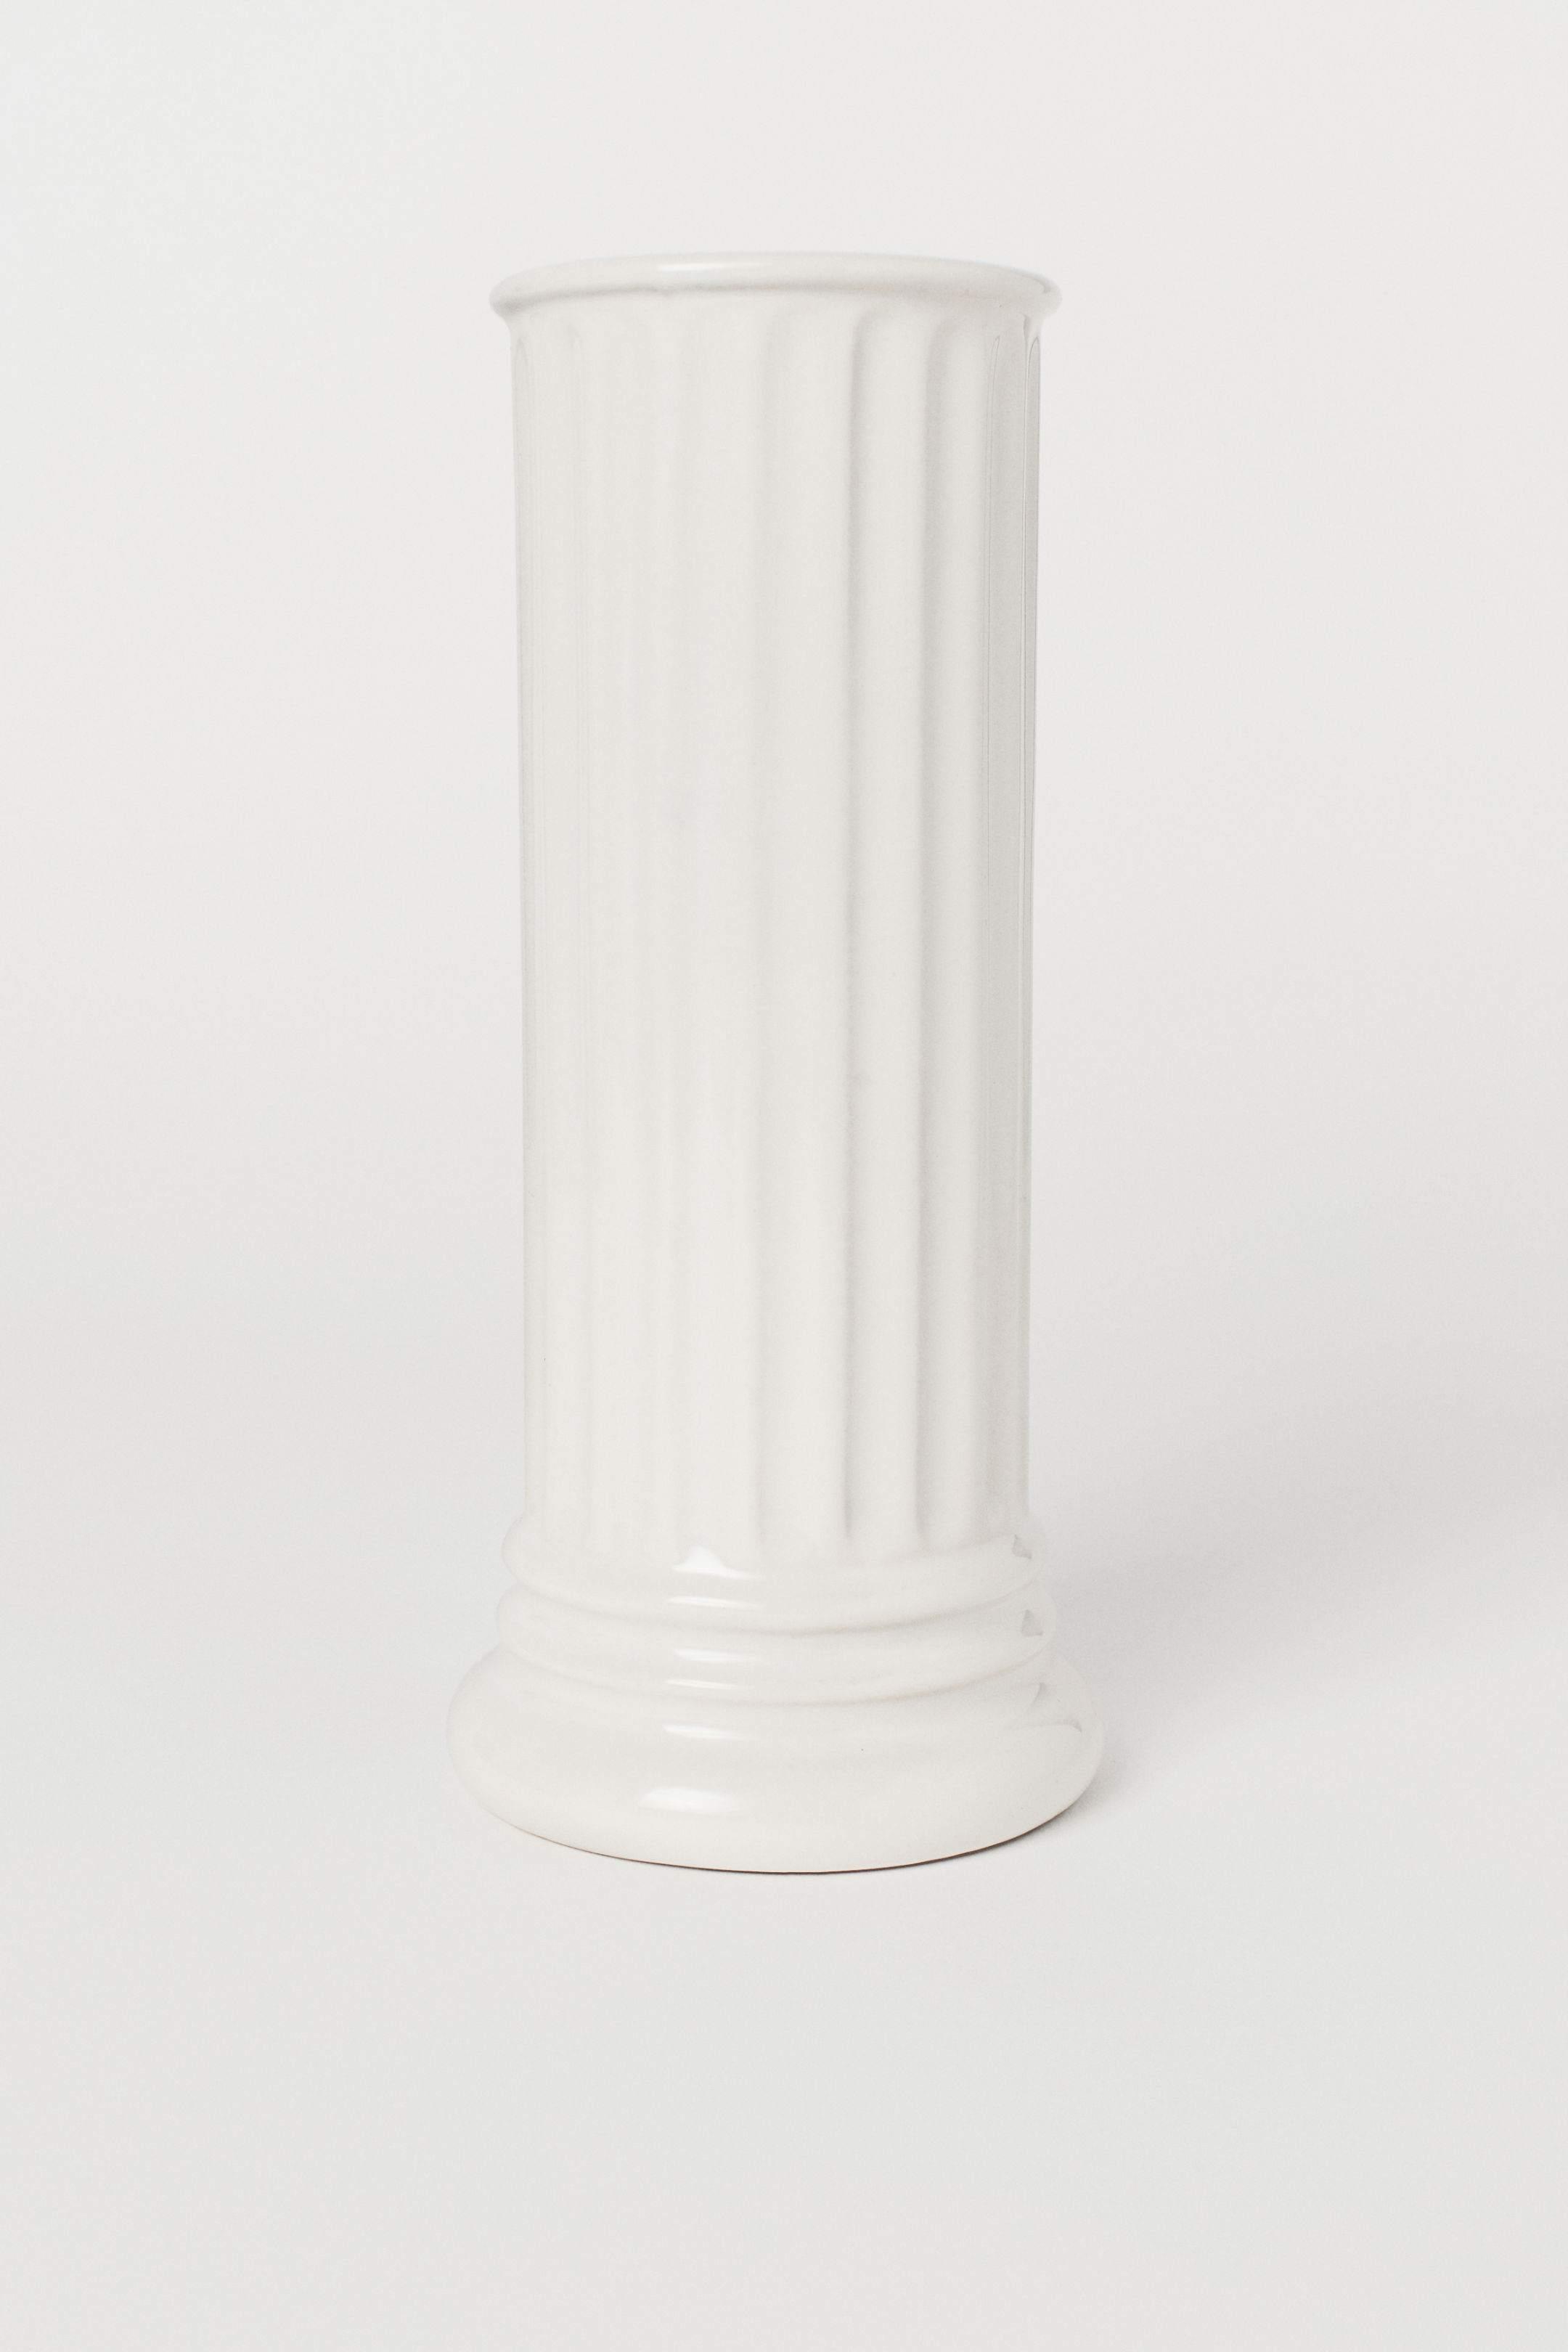 H&M Home stoneware vase